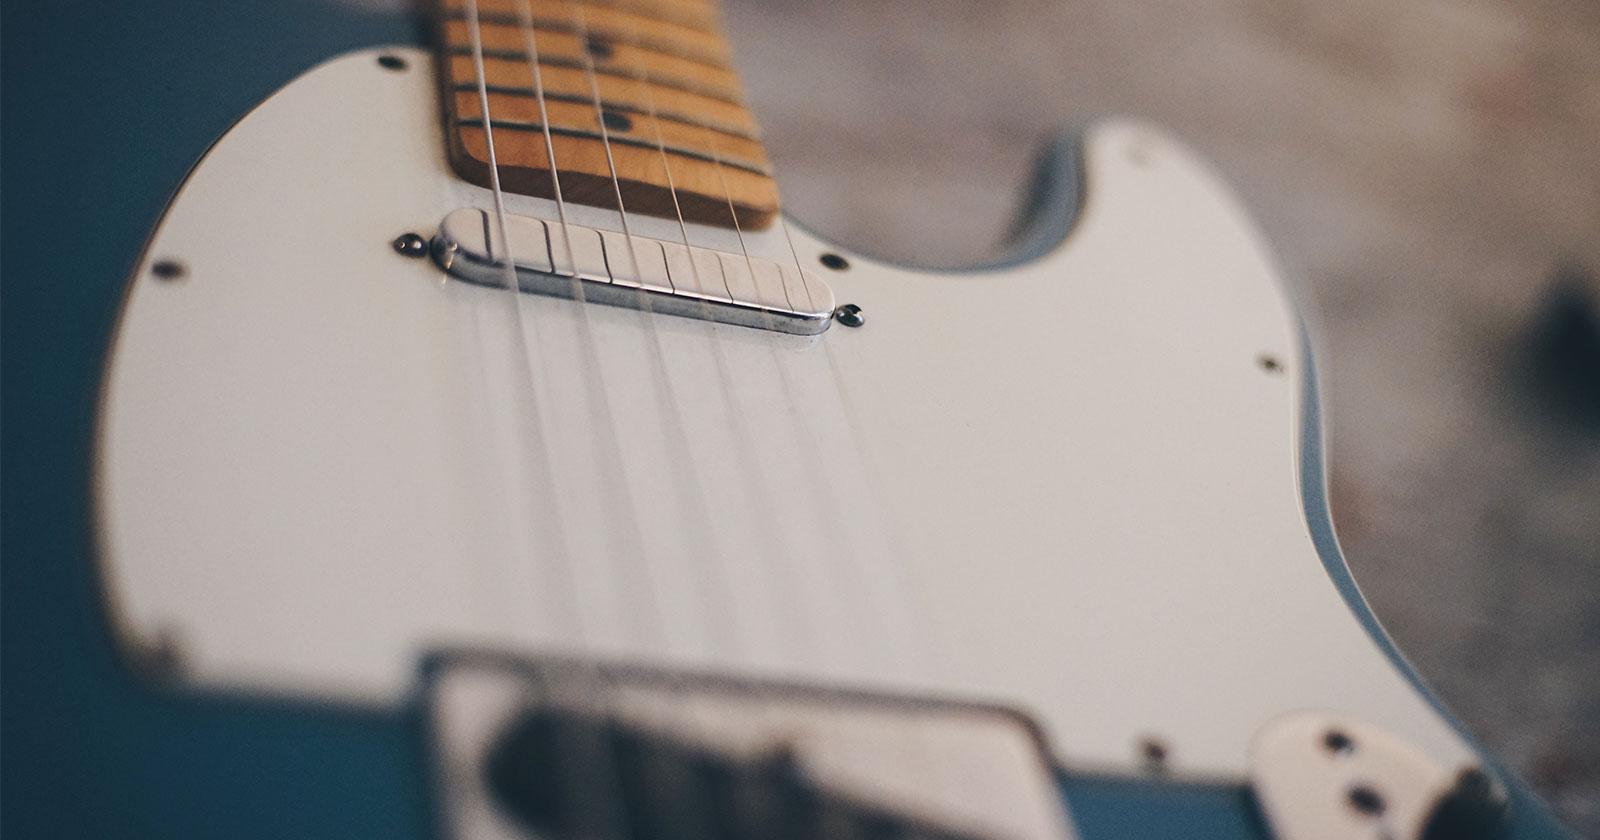 guitarras estilo telecaster baratas